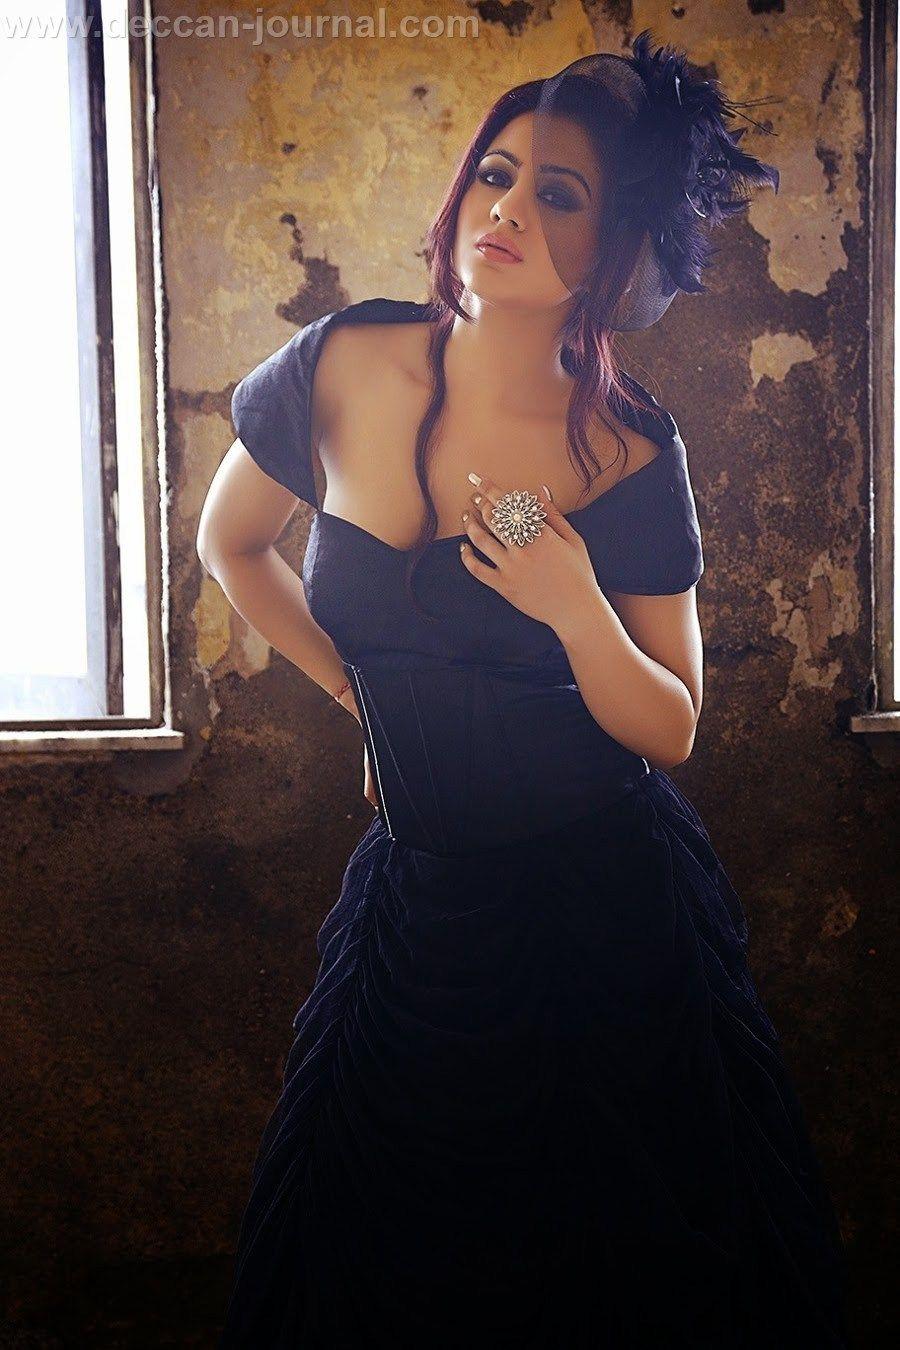 Cleavage Angelina Love nude photos 2019